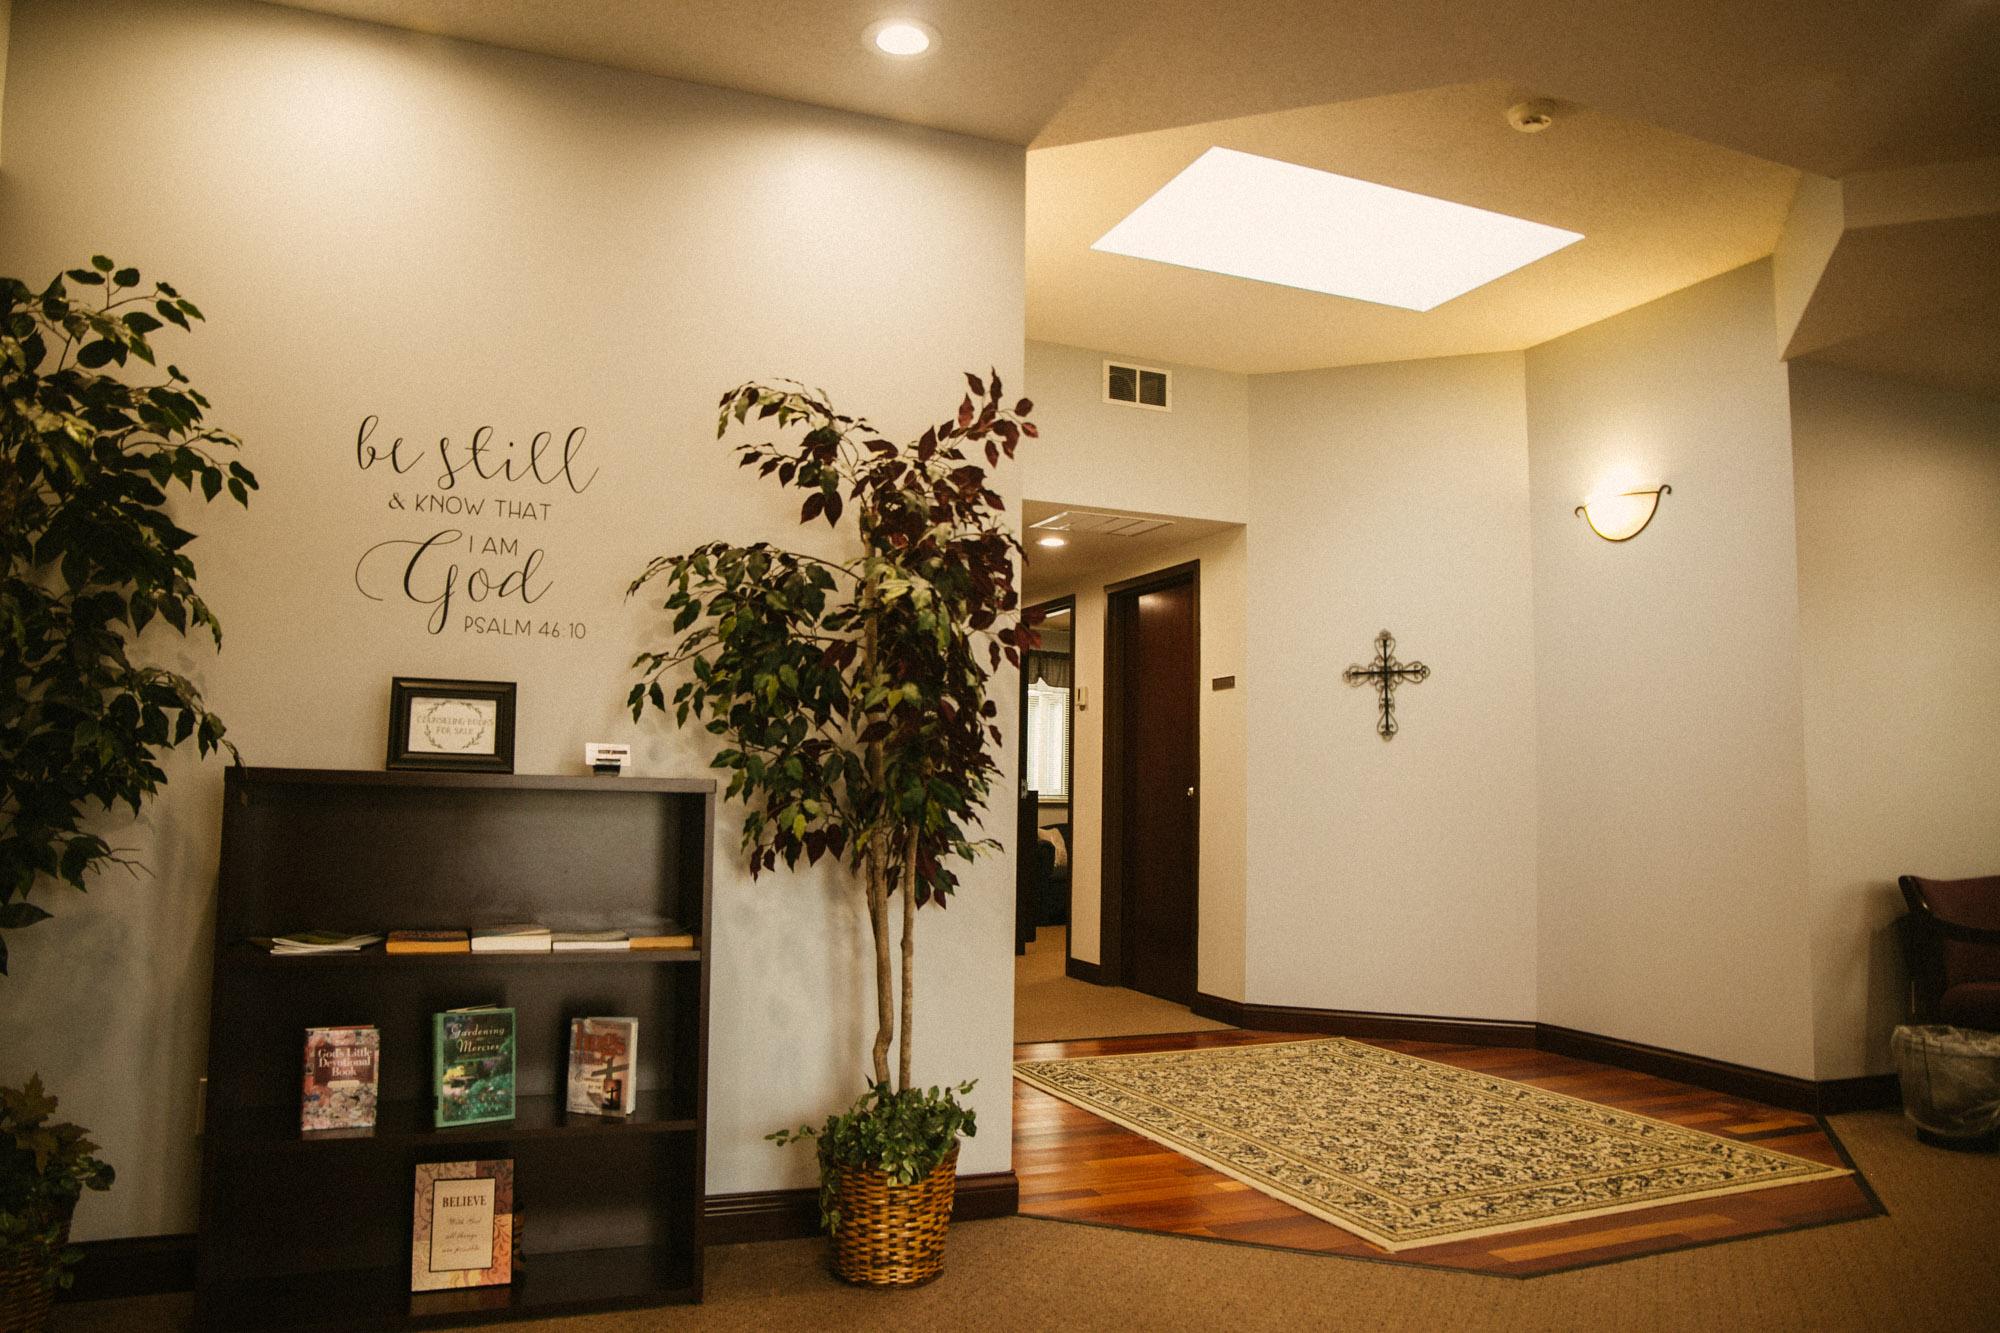 A warm, inviting hallway and lobby area